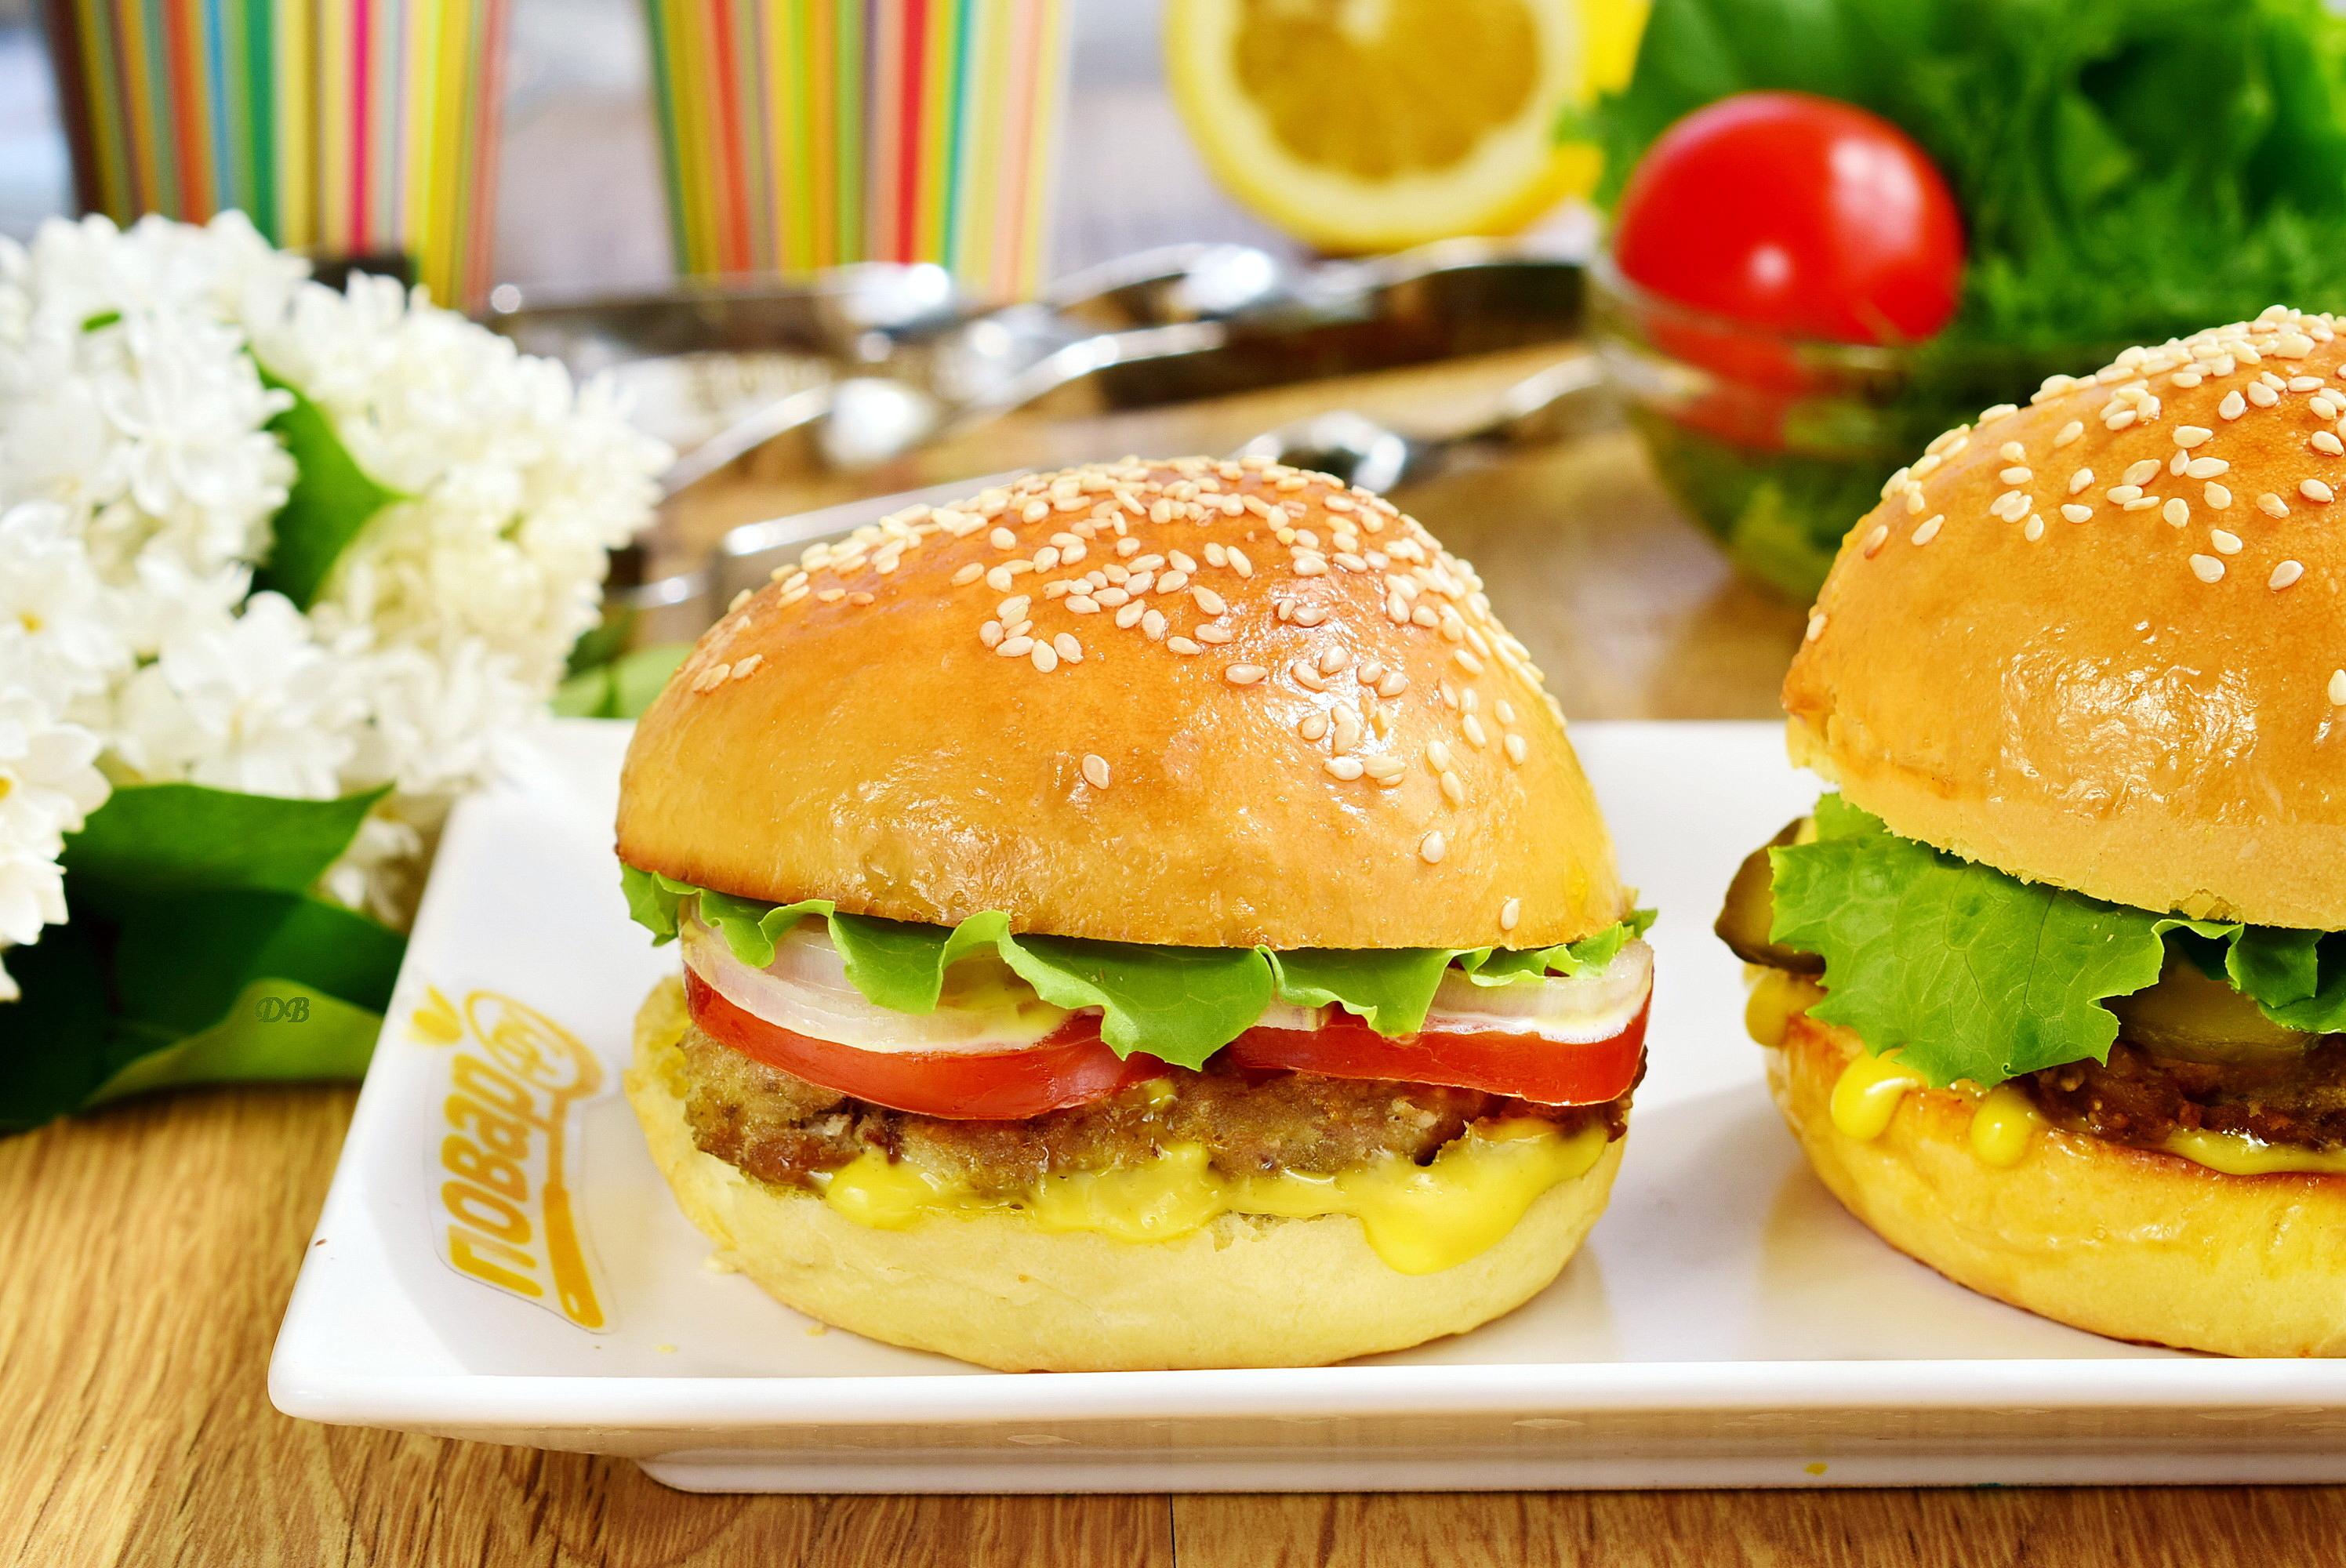 Рыбный бургер или фишбургер